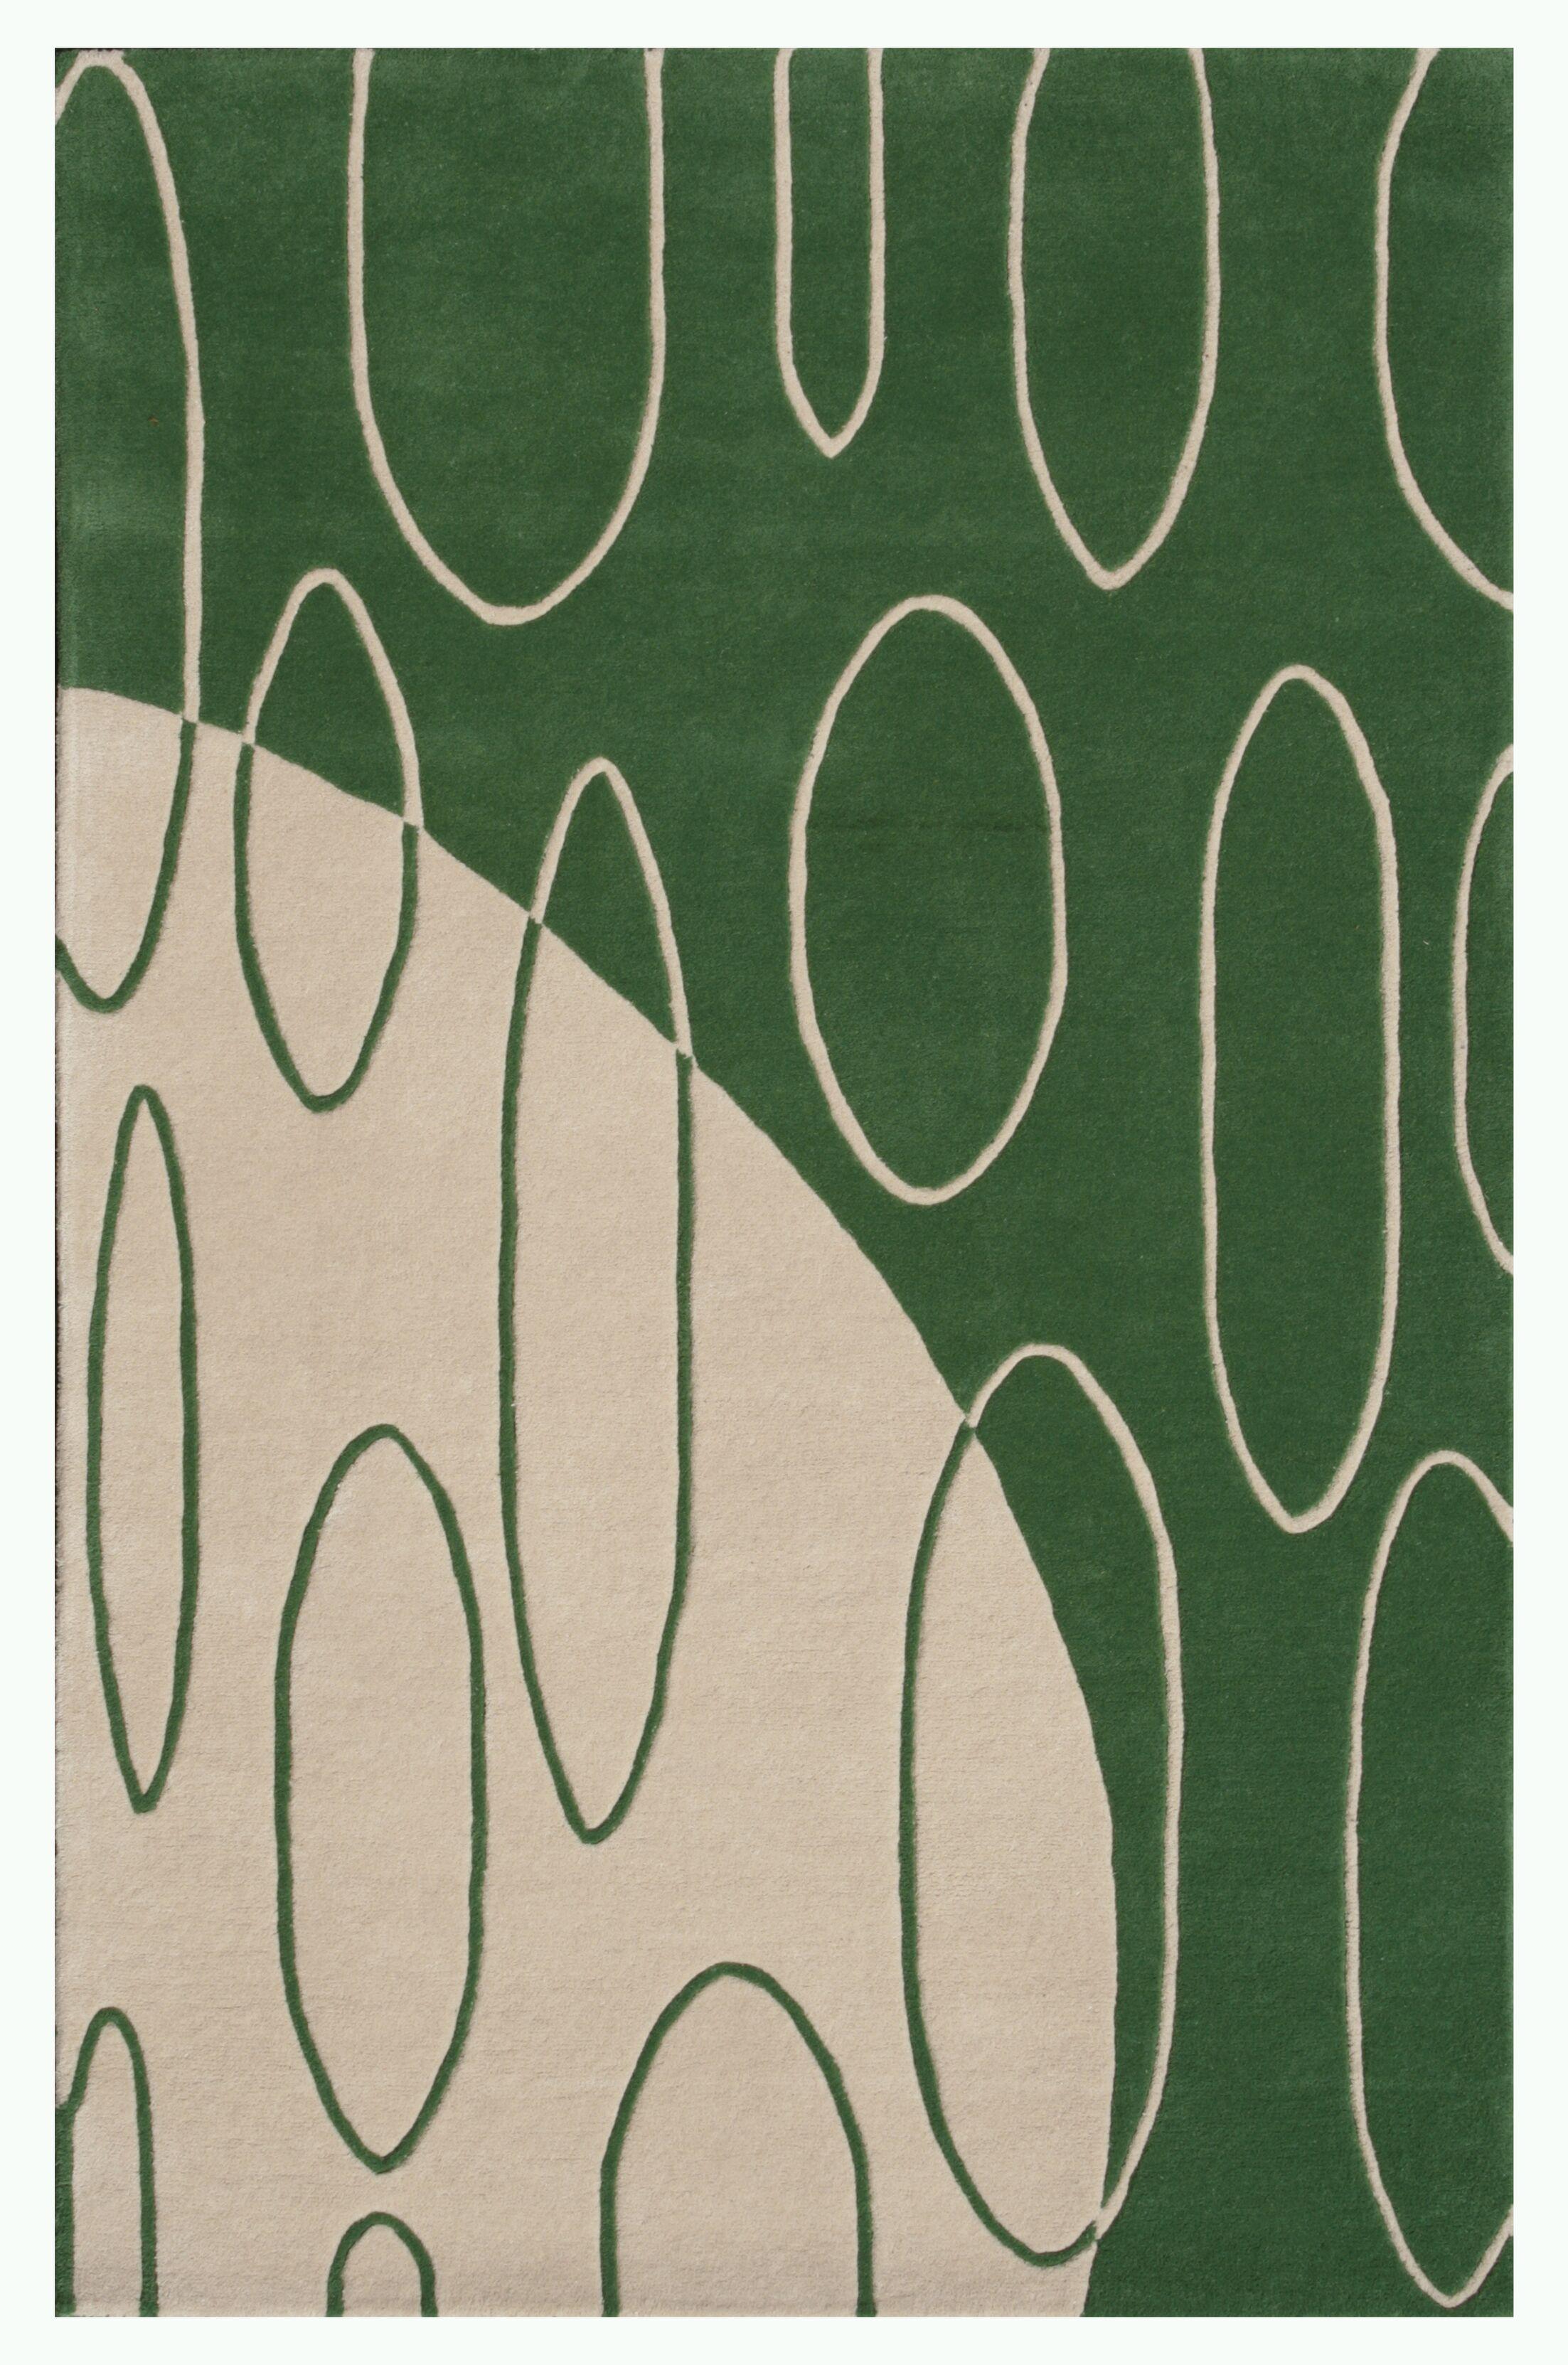 Aria Green Shag Area Rug Rug Size: 5' x 7'6